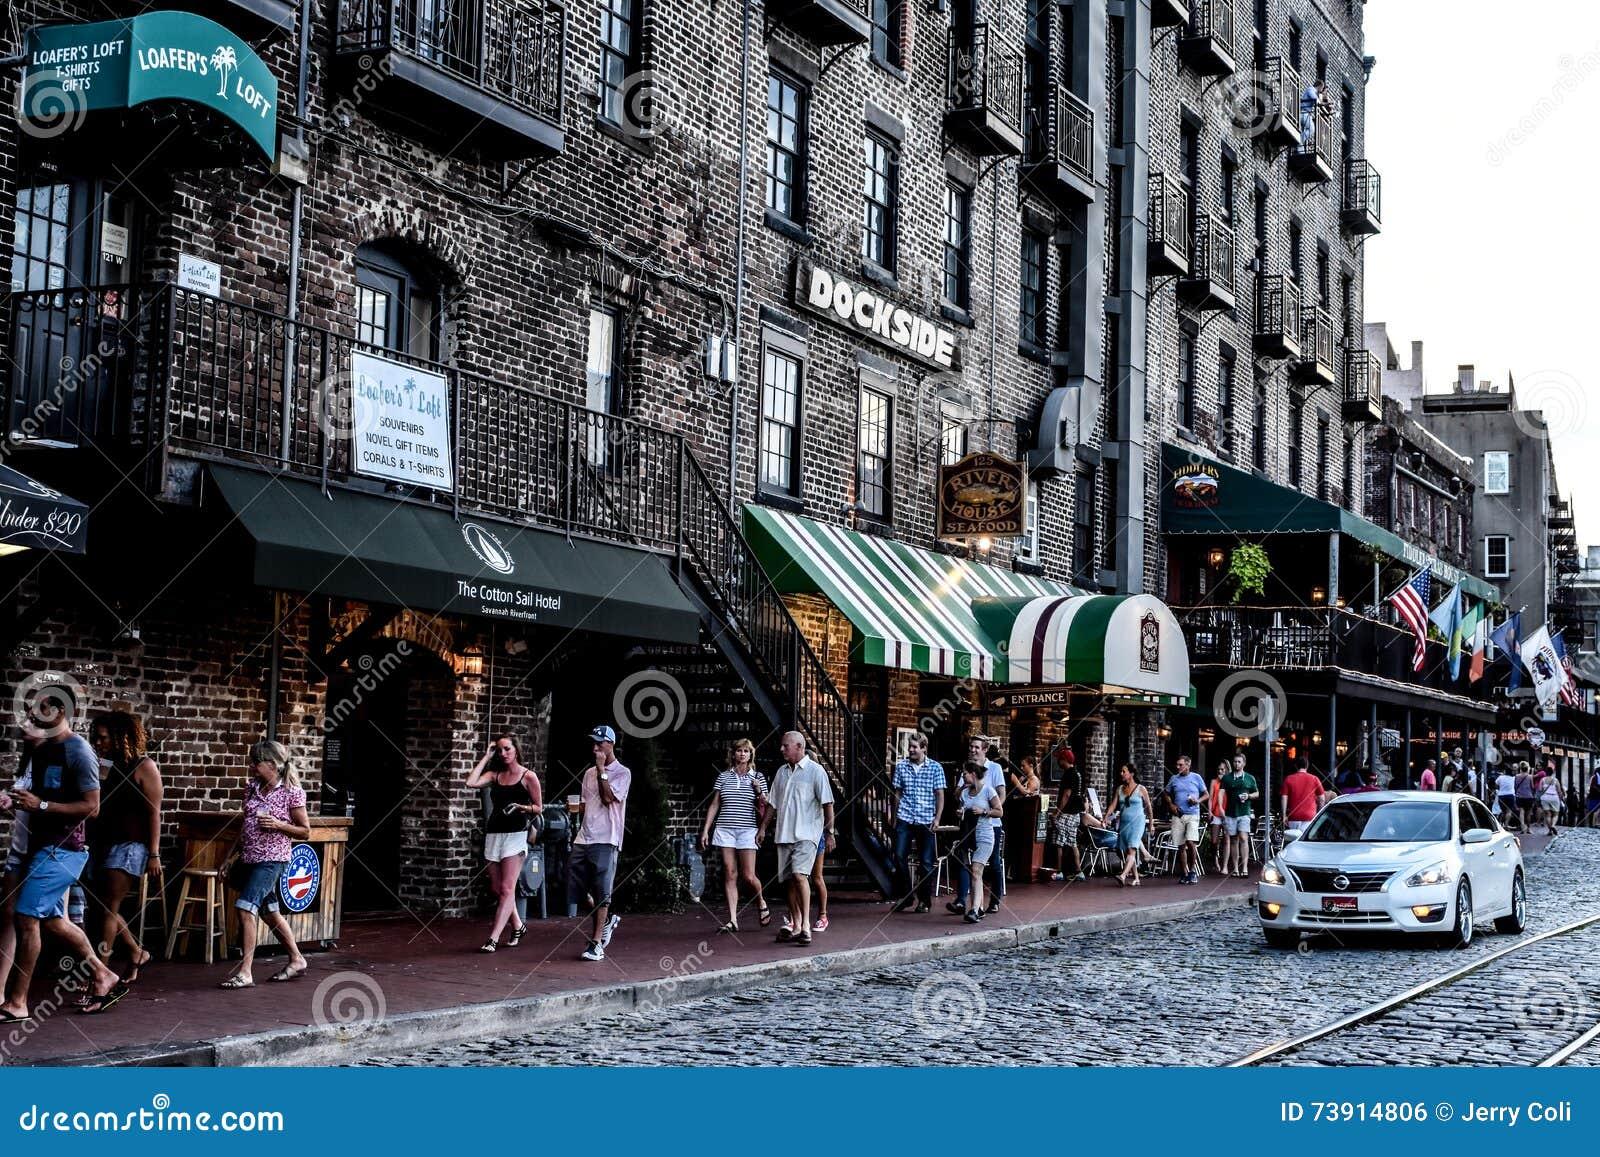 Savannah s famous River Street